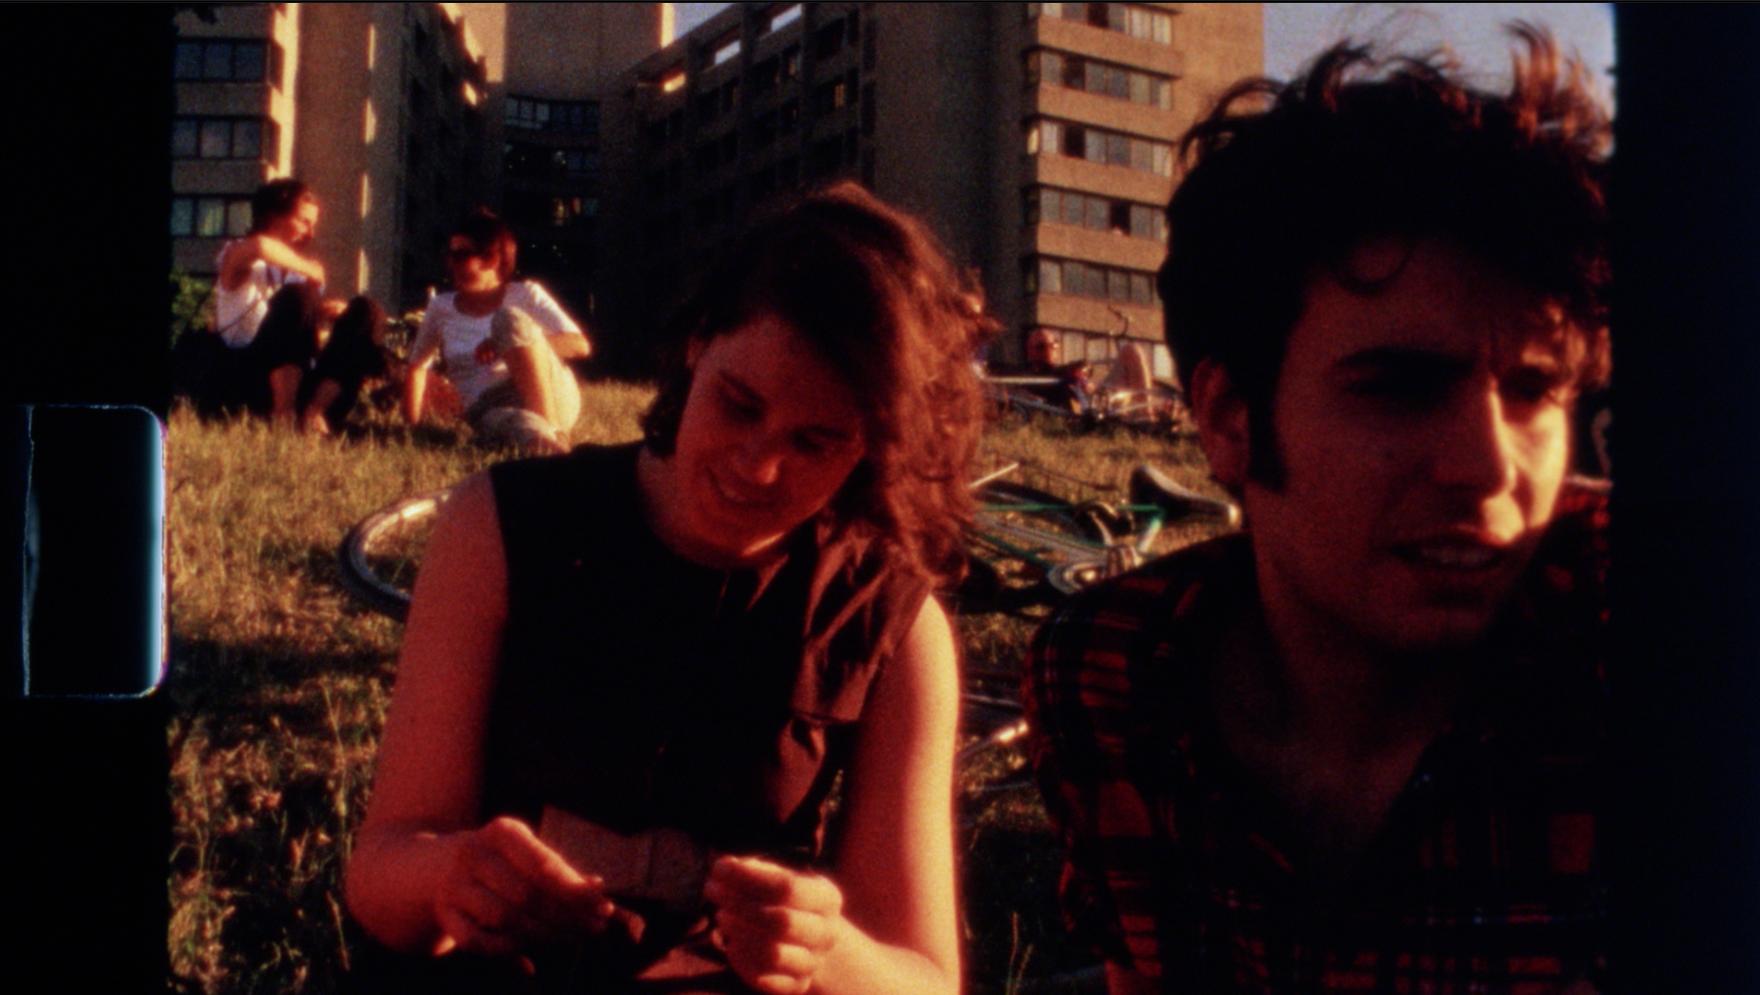 Mariana Caló and Francisco Queimadela, Berlin, Germany.